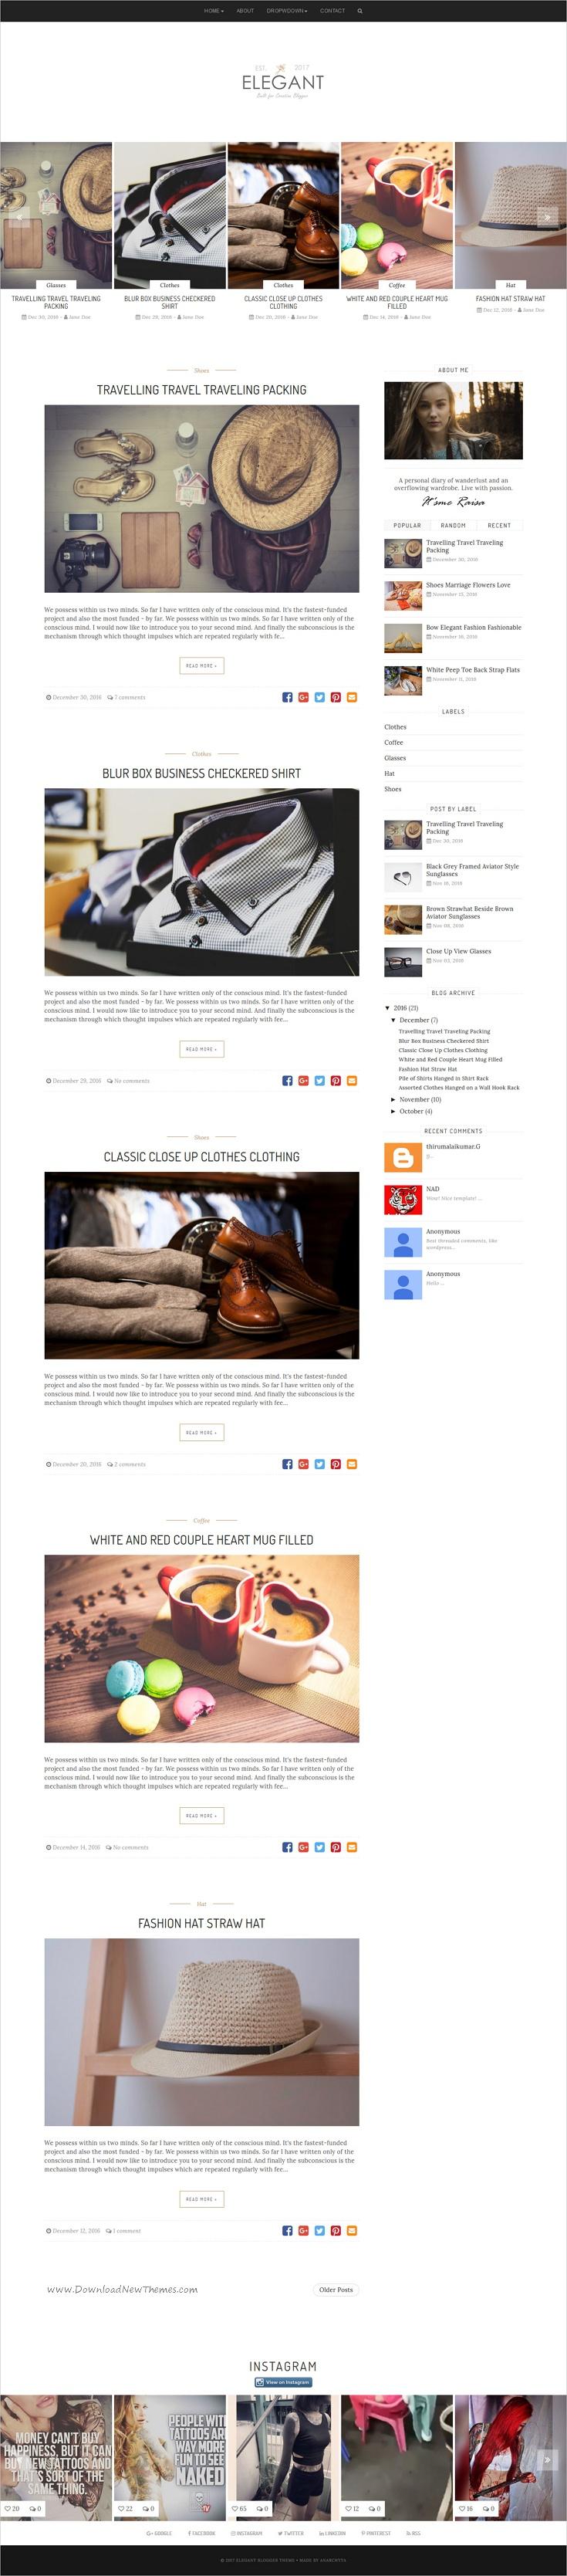 Raisa - An Elegant Responsive Blogger Theme